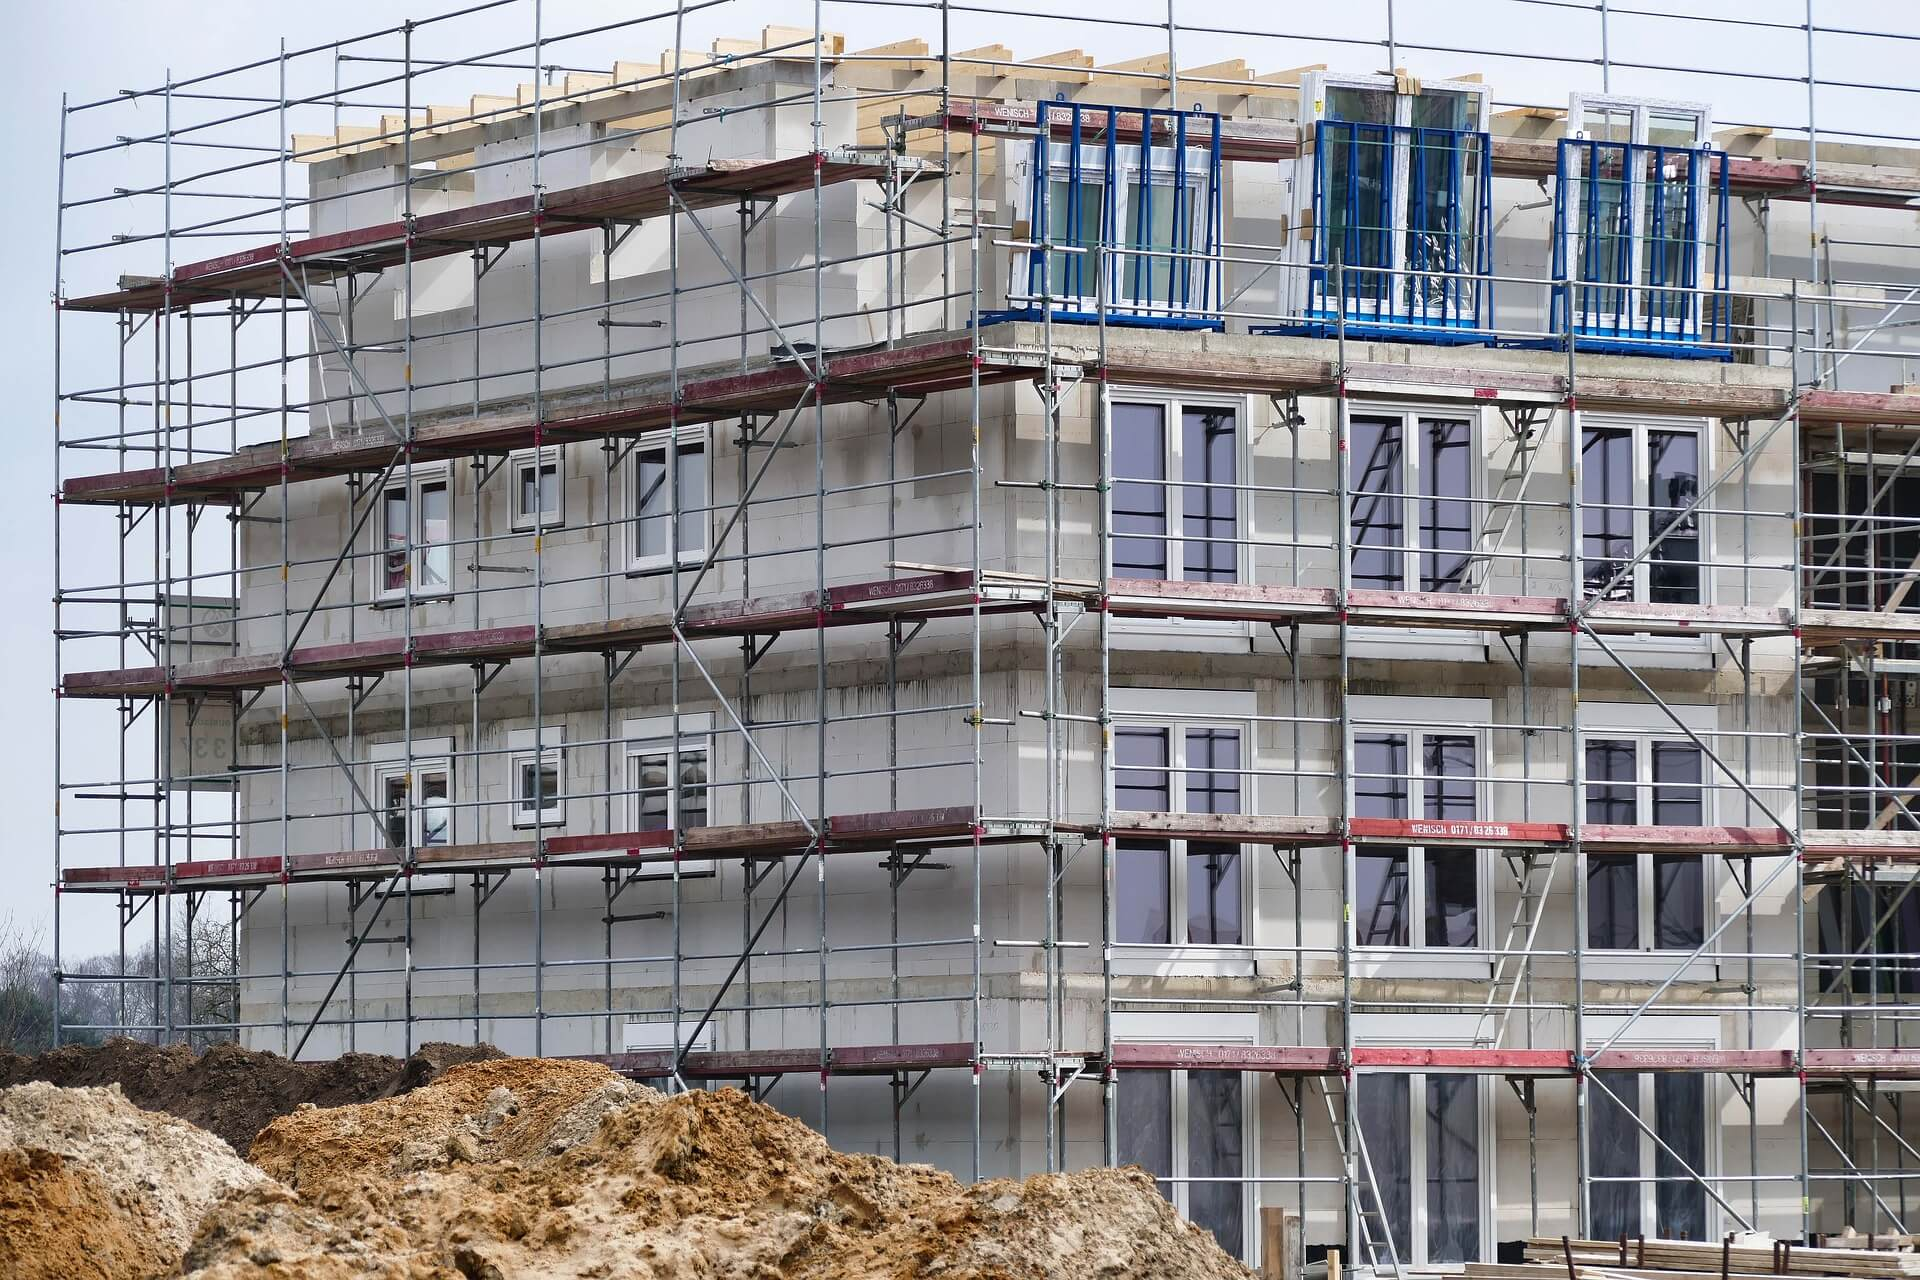 Zgrada / Gradnja